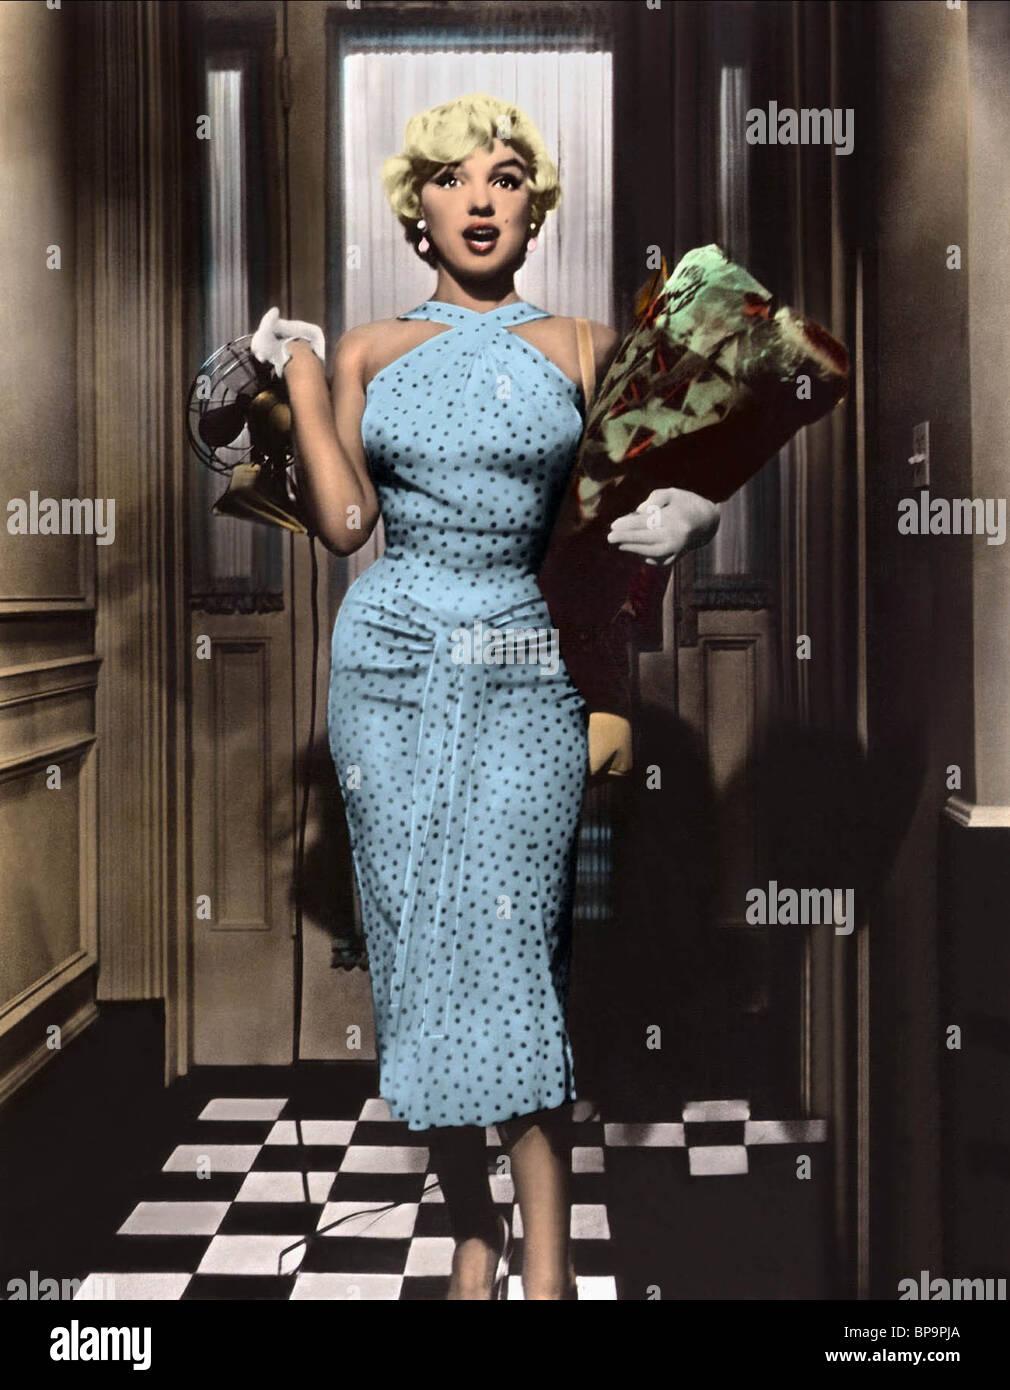 Marilyn Monroe Dress Stock Photos & Marilyn Monroe Dress Stock ...